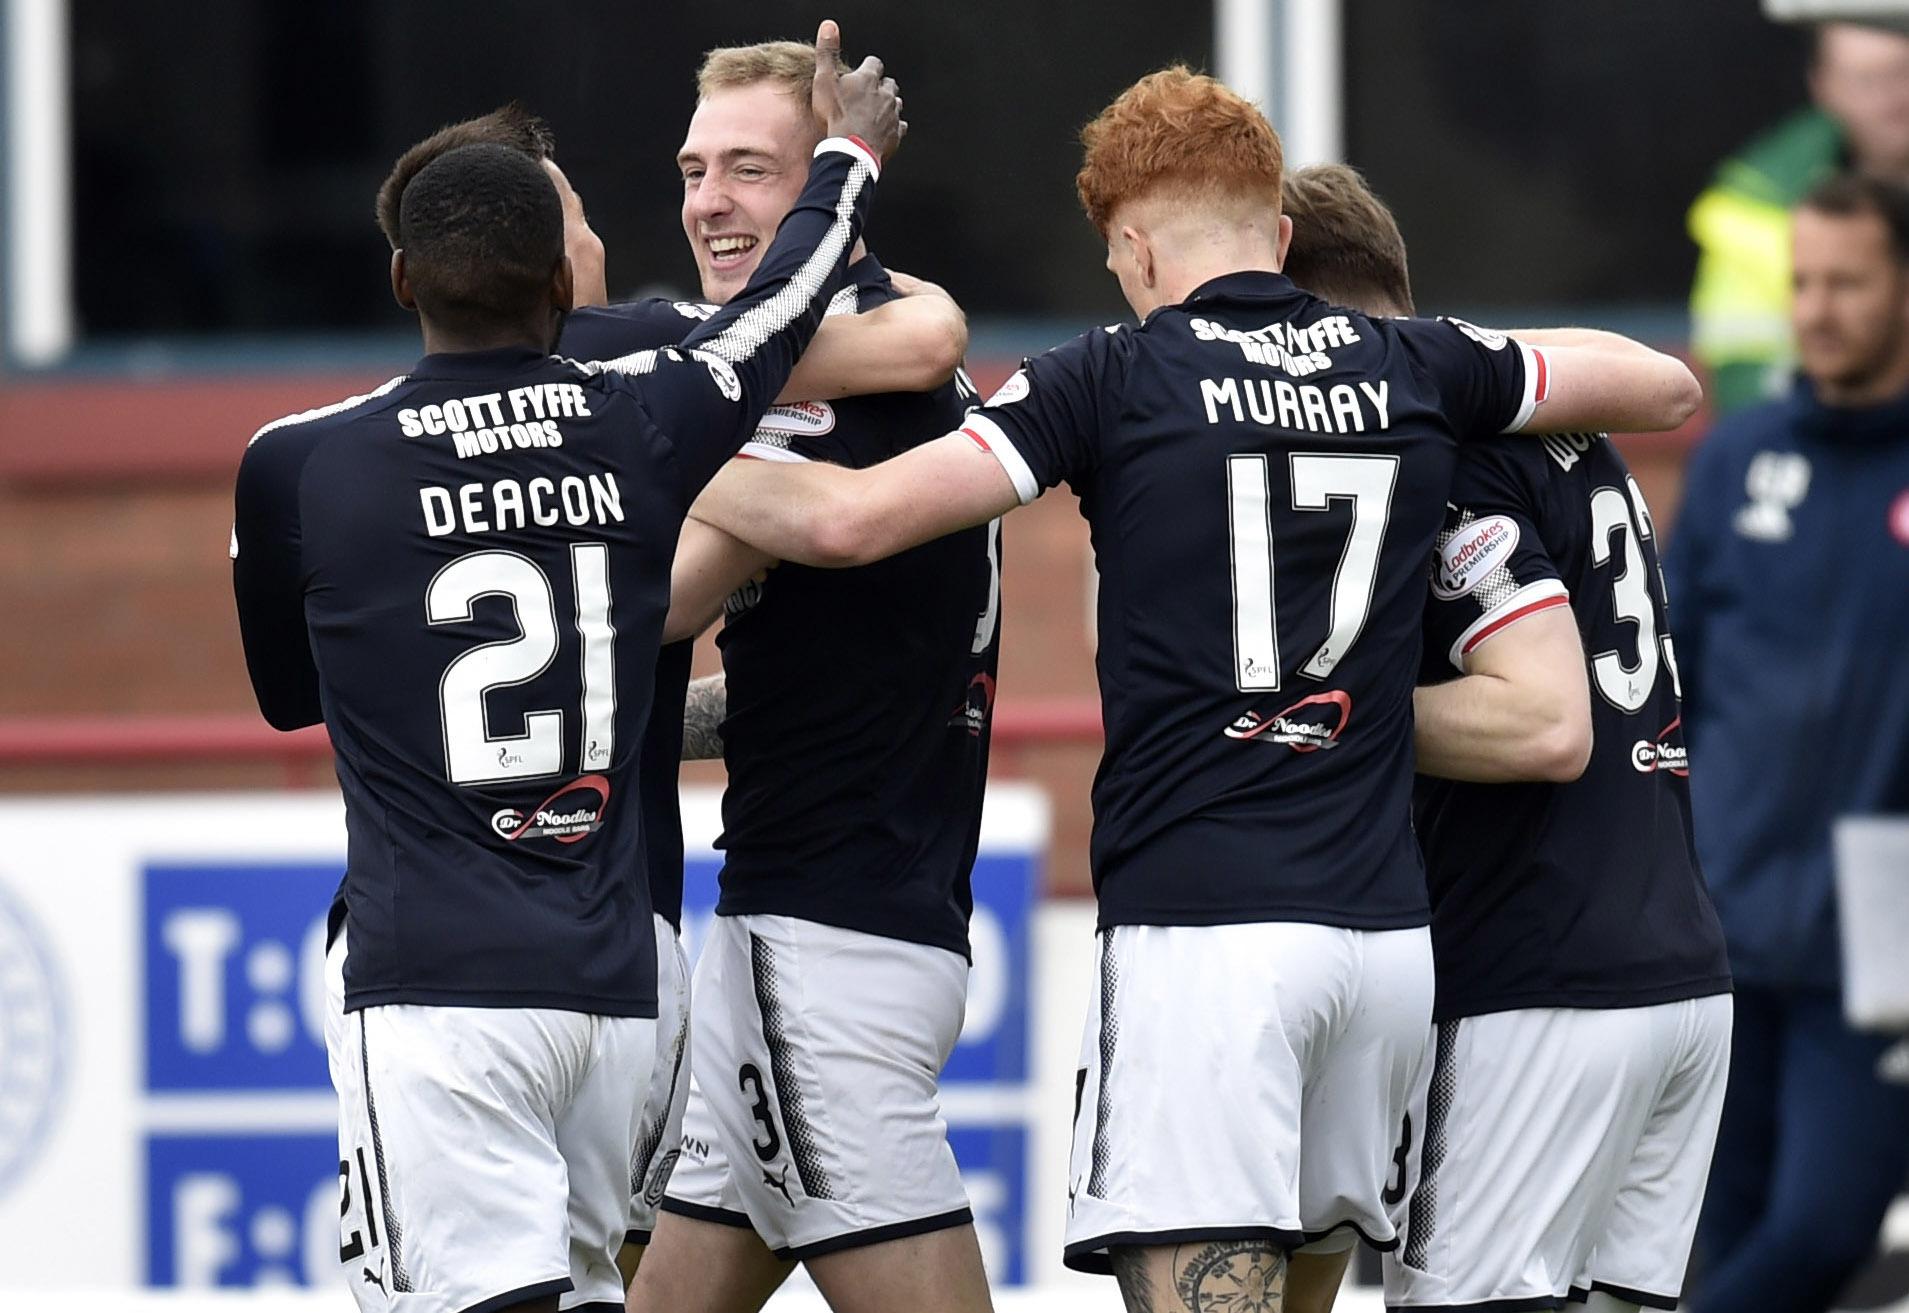 05/05/18 LADBROKES PREMIERSHIP   DUNDEE V HAMILTON   DENS PARK - DUNDEE  Dundee's Kevin Holt (3) celebrates his goal with the Dundee team